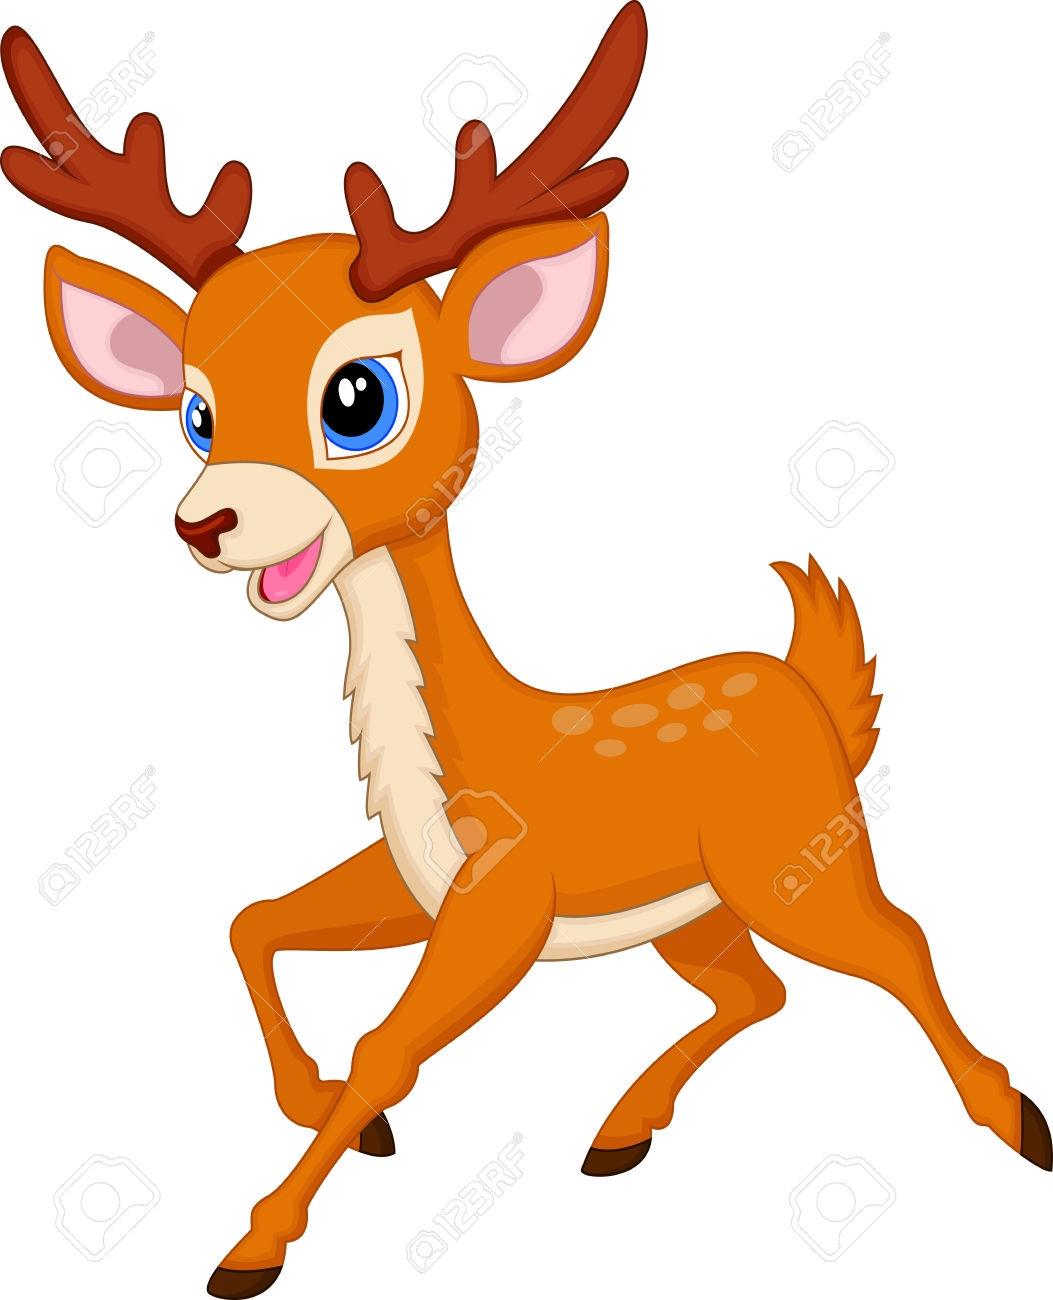 deer face clipart at getdrawings com free for personal use deer rh getdrawings com clip art deer trees clip art deer images